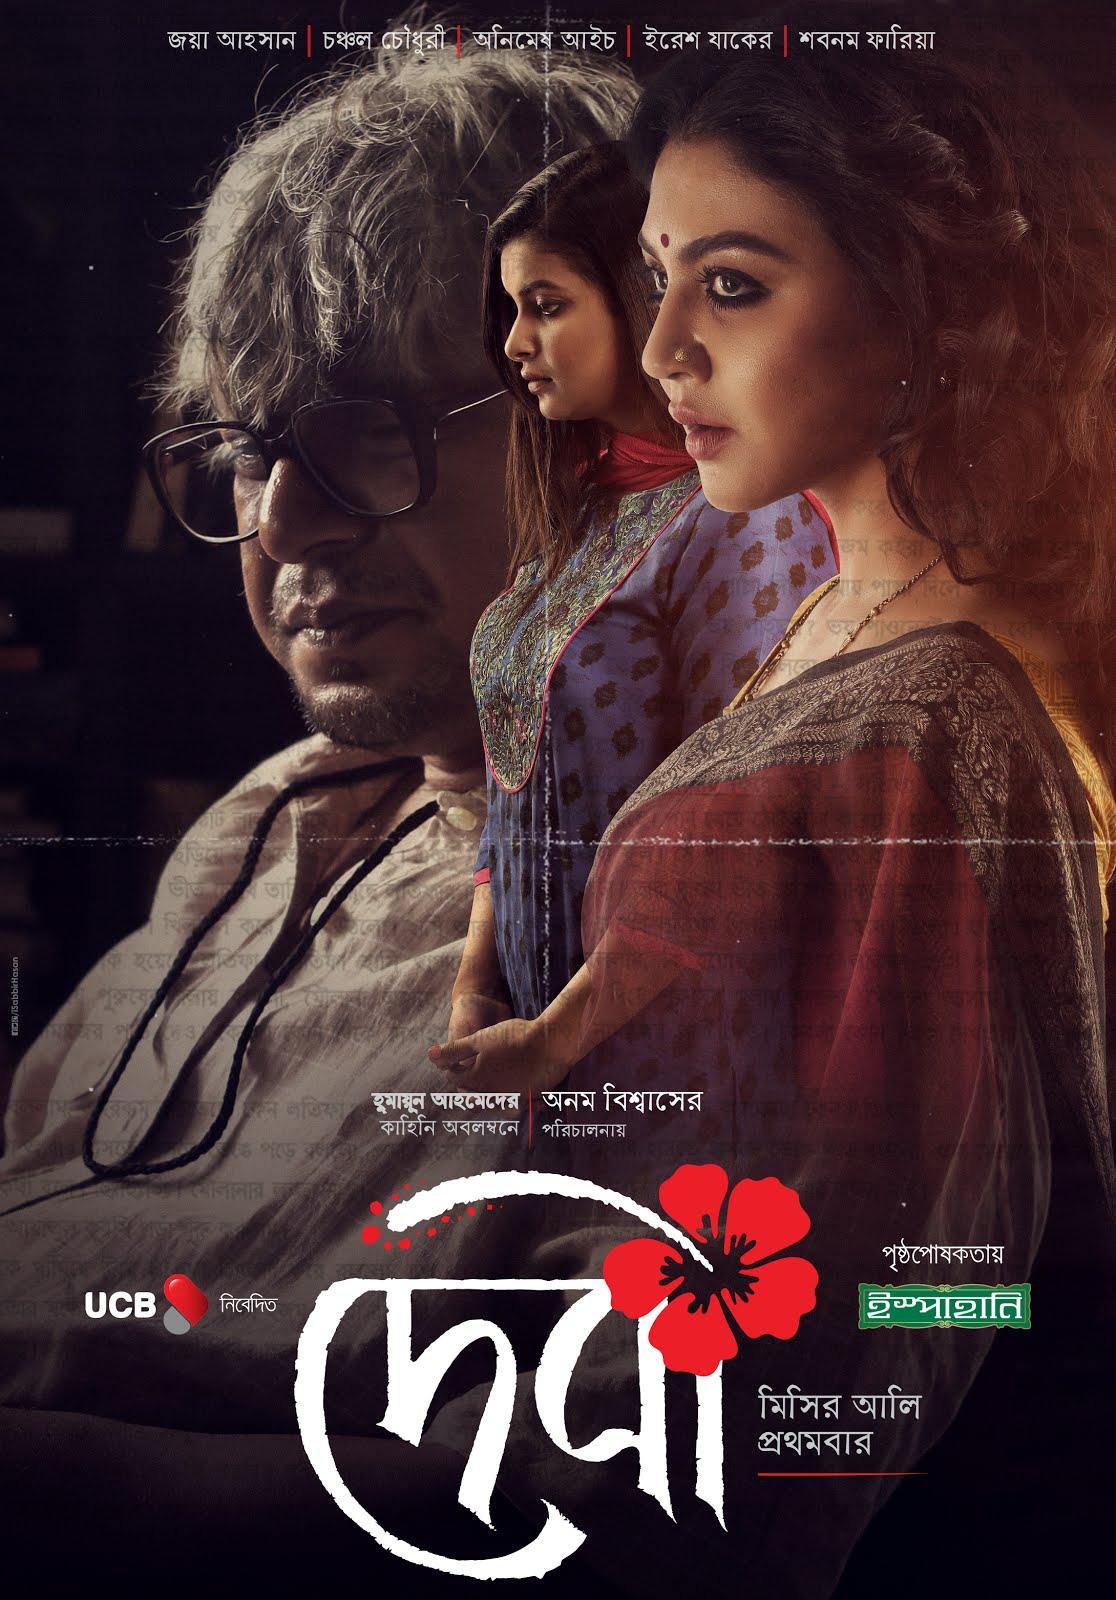 Debi (2018) Bengali WEB-DL 720p x264 500MB